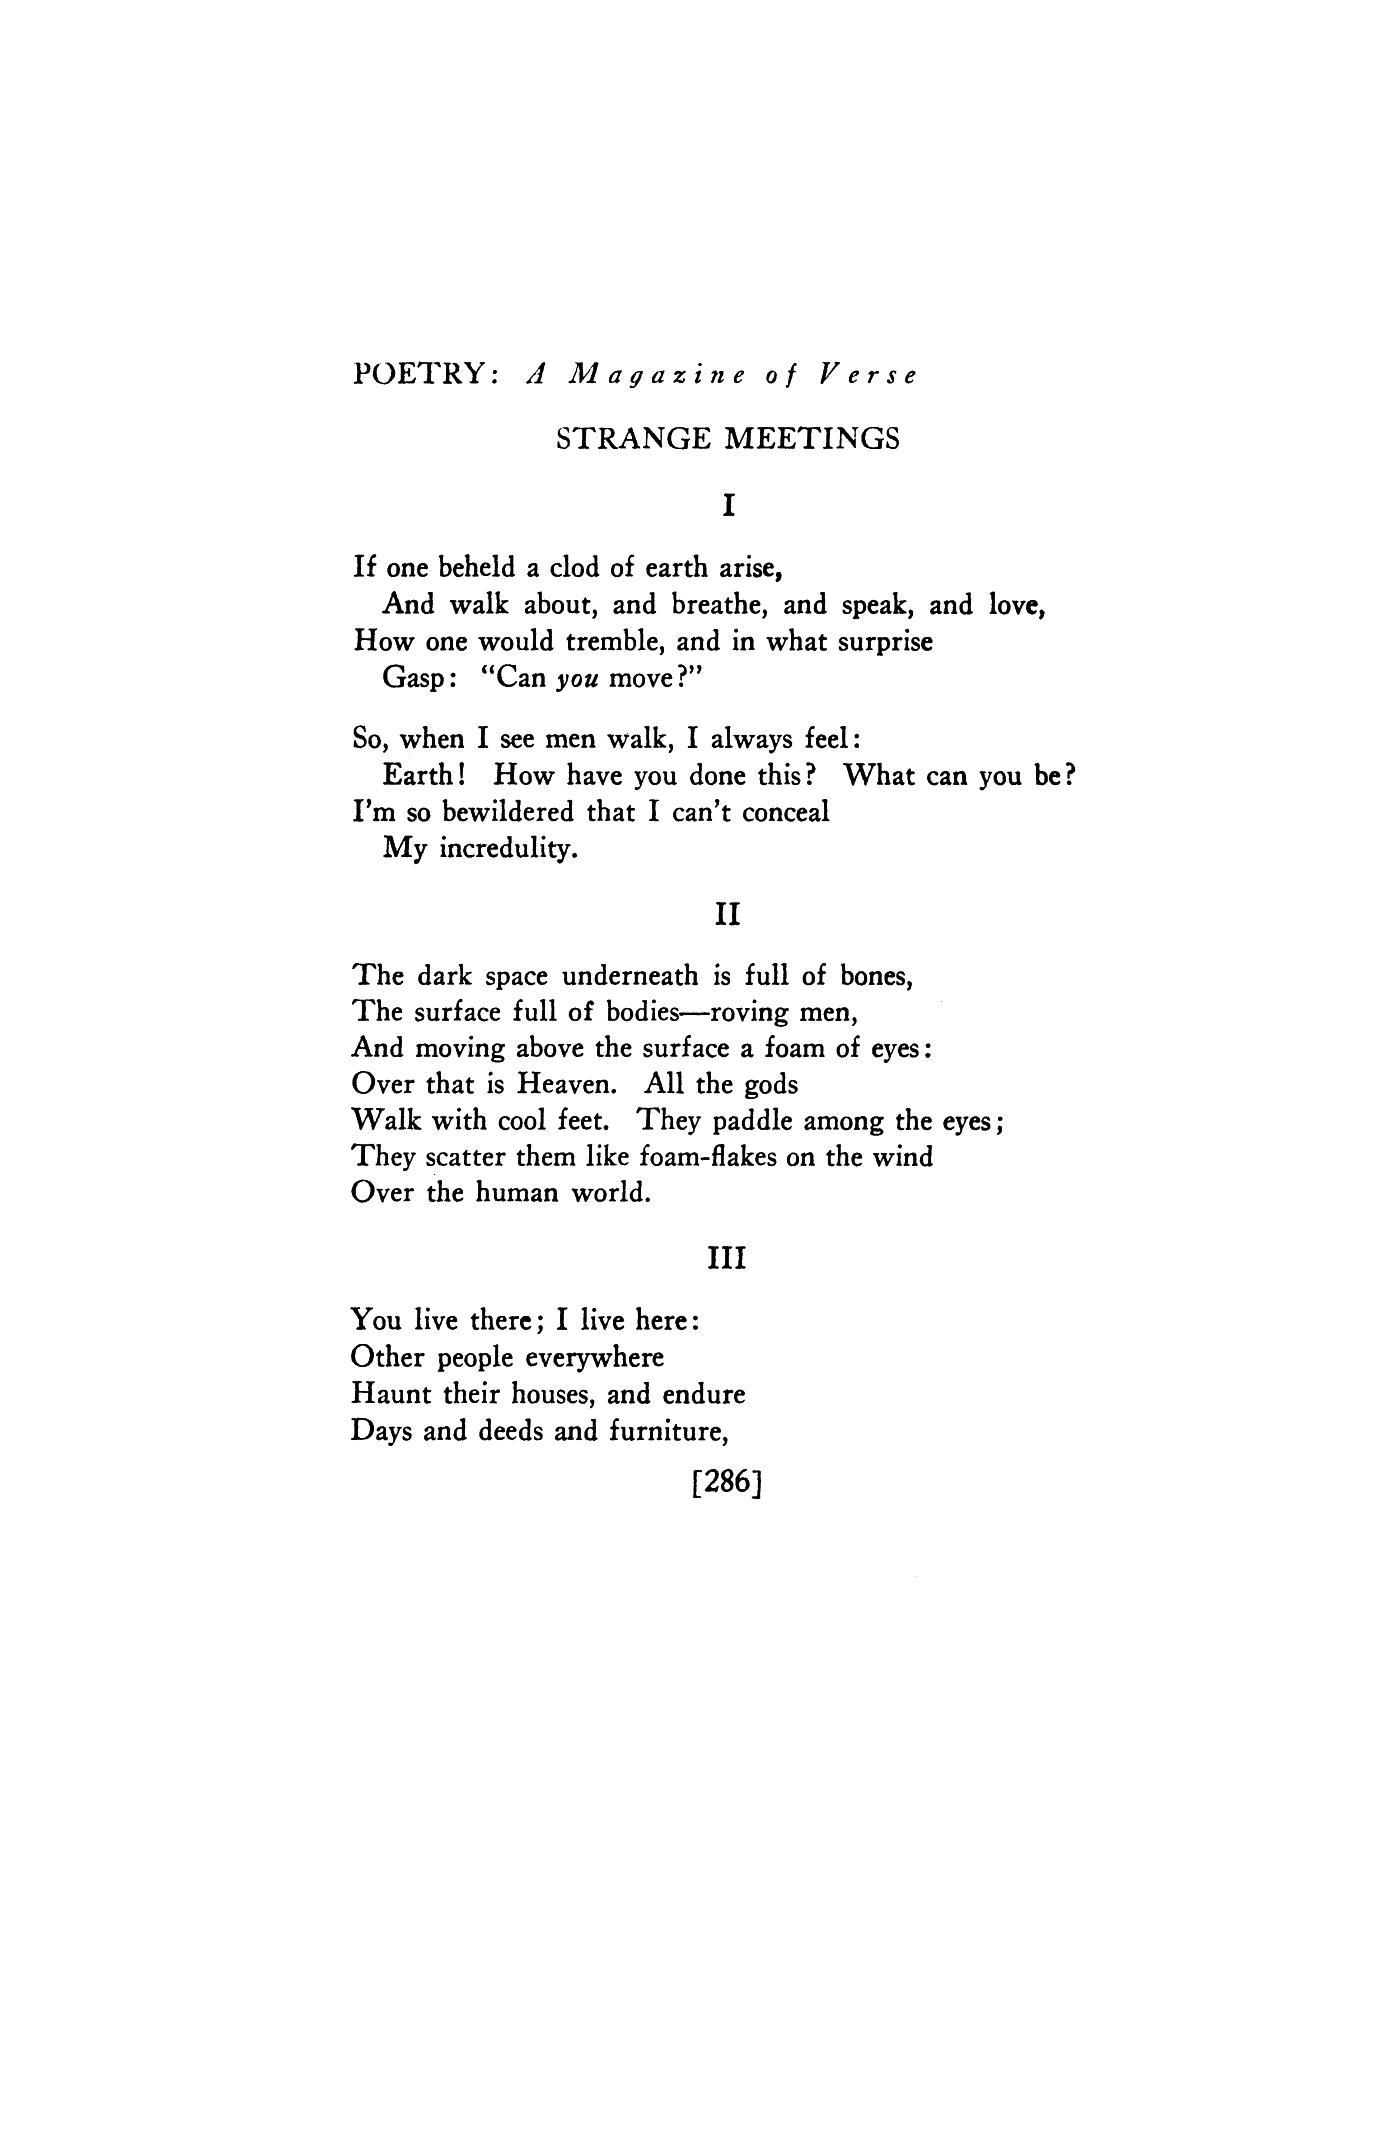 Strange Meetings by Harold Monro   Poetry Magazine